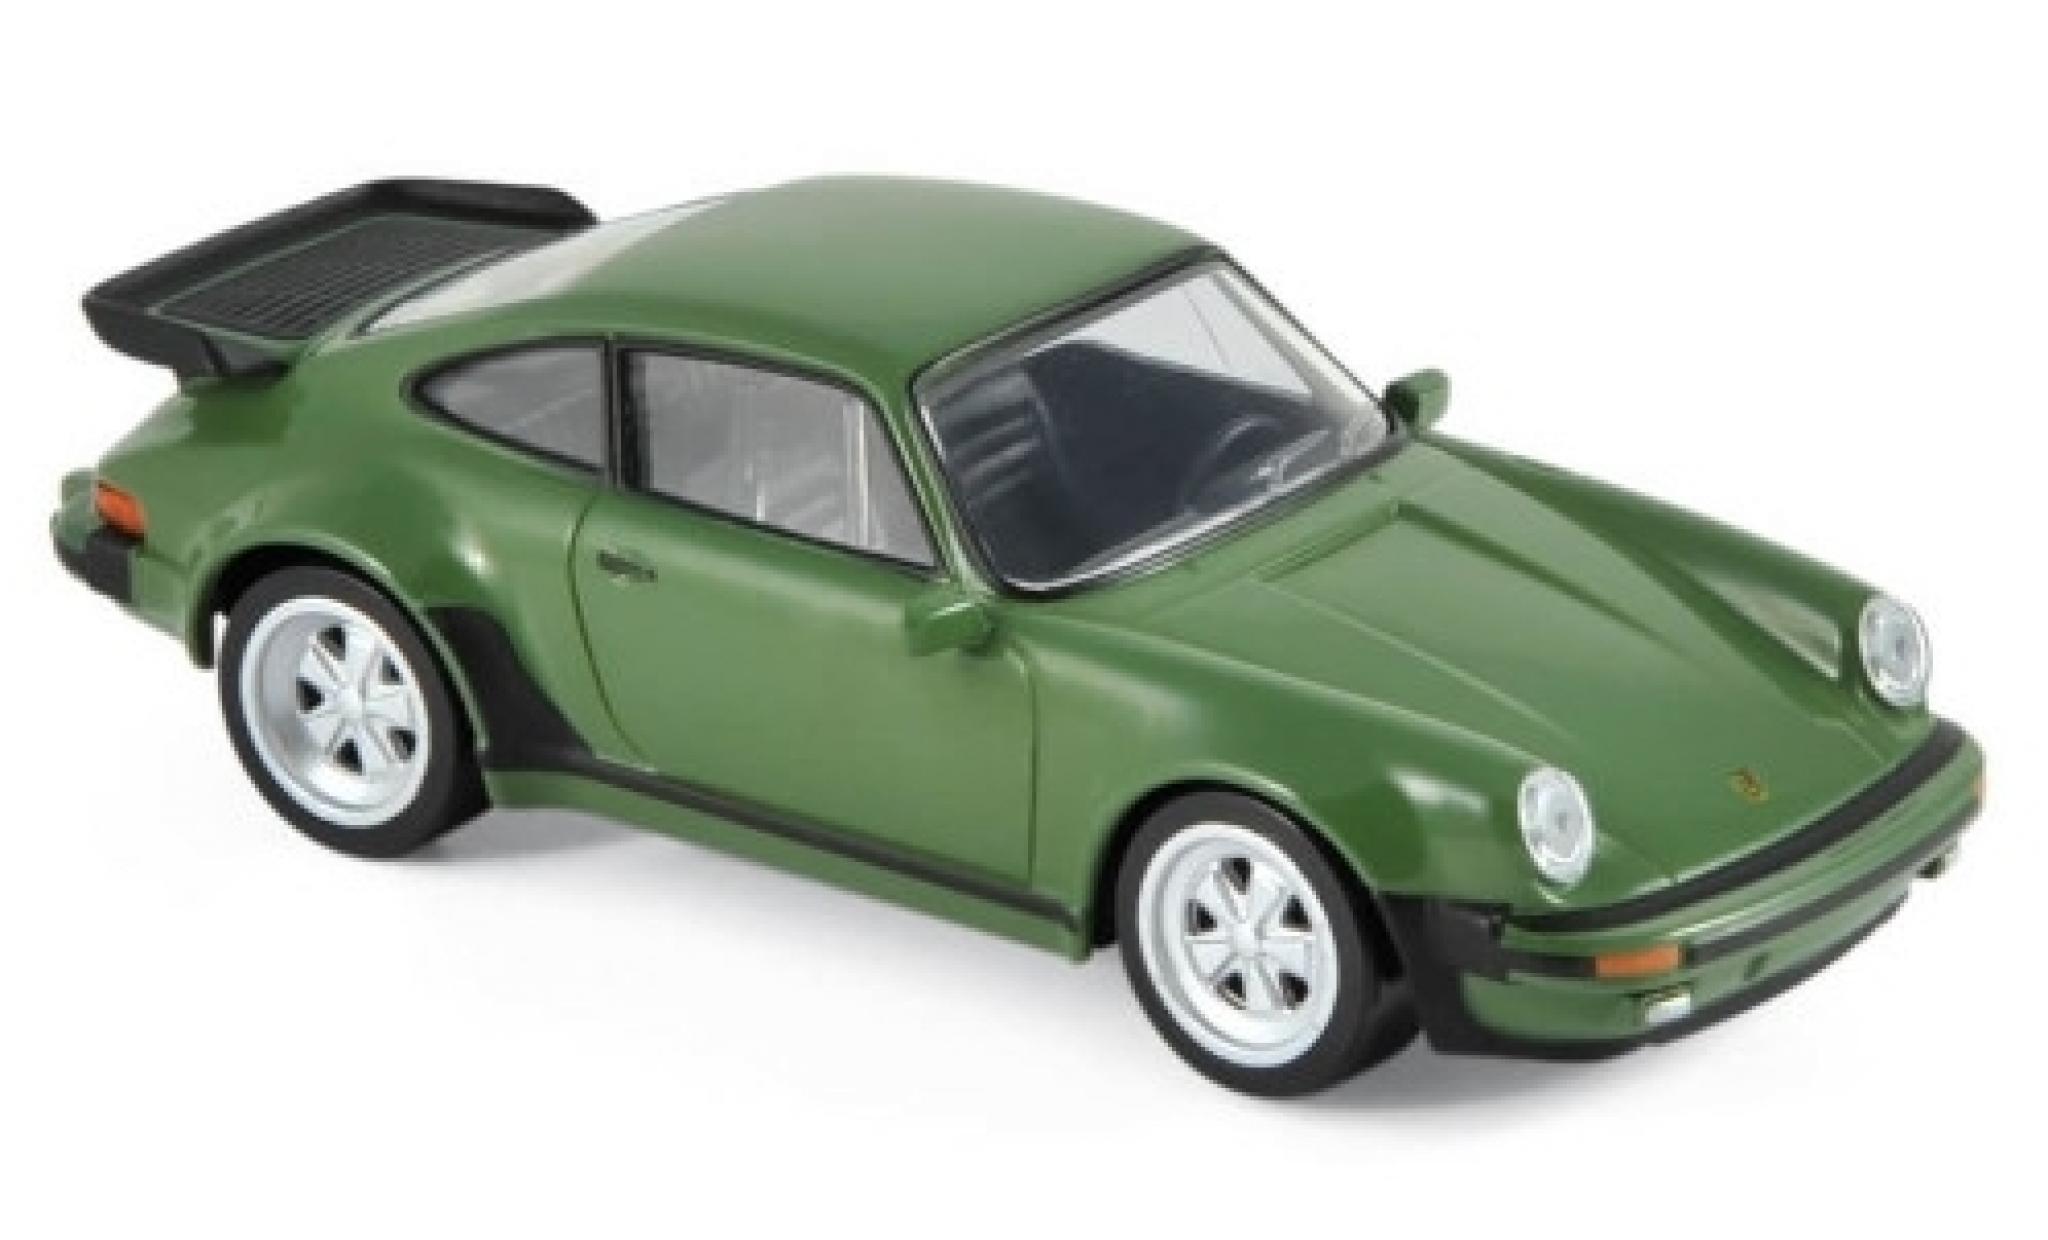 Porsche 930 Turbo 1/43 Norev 911 3.3 verte 1978 Jetcar